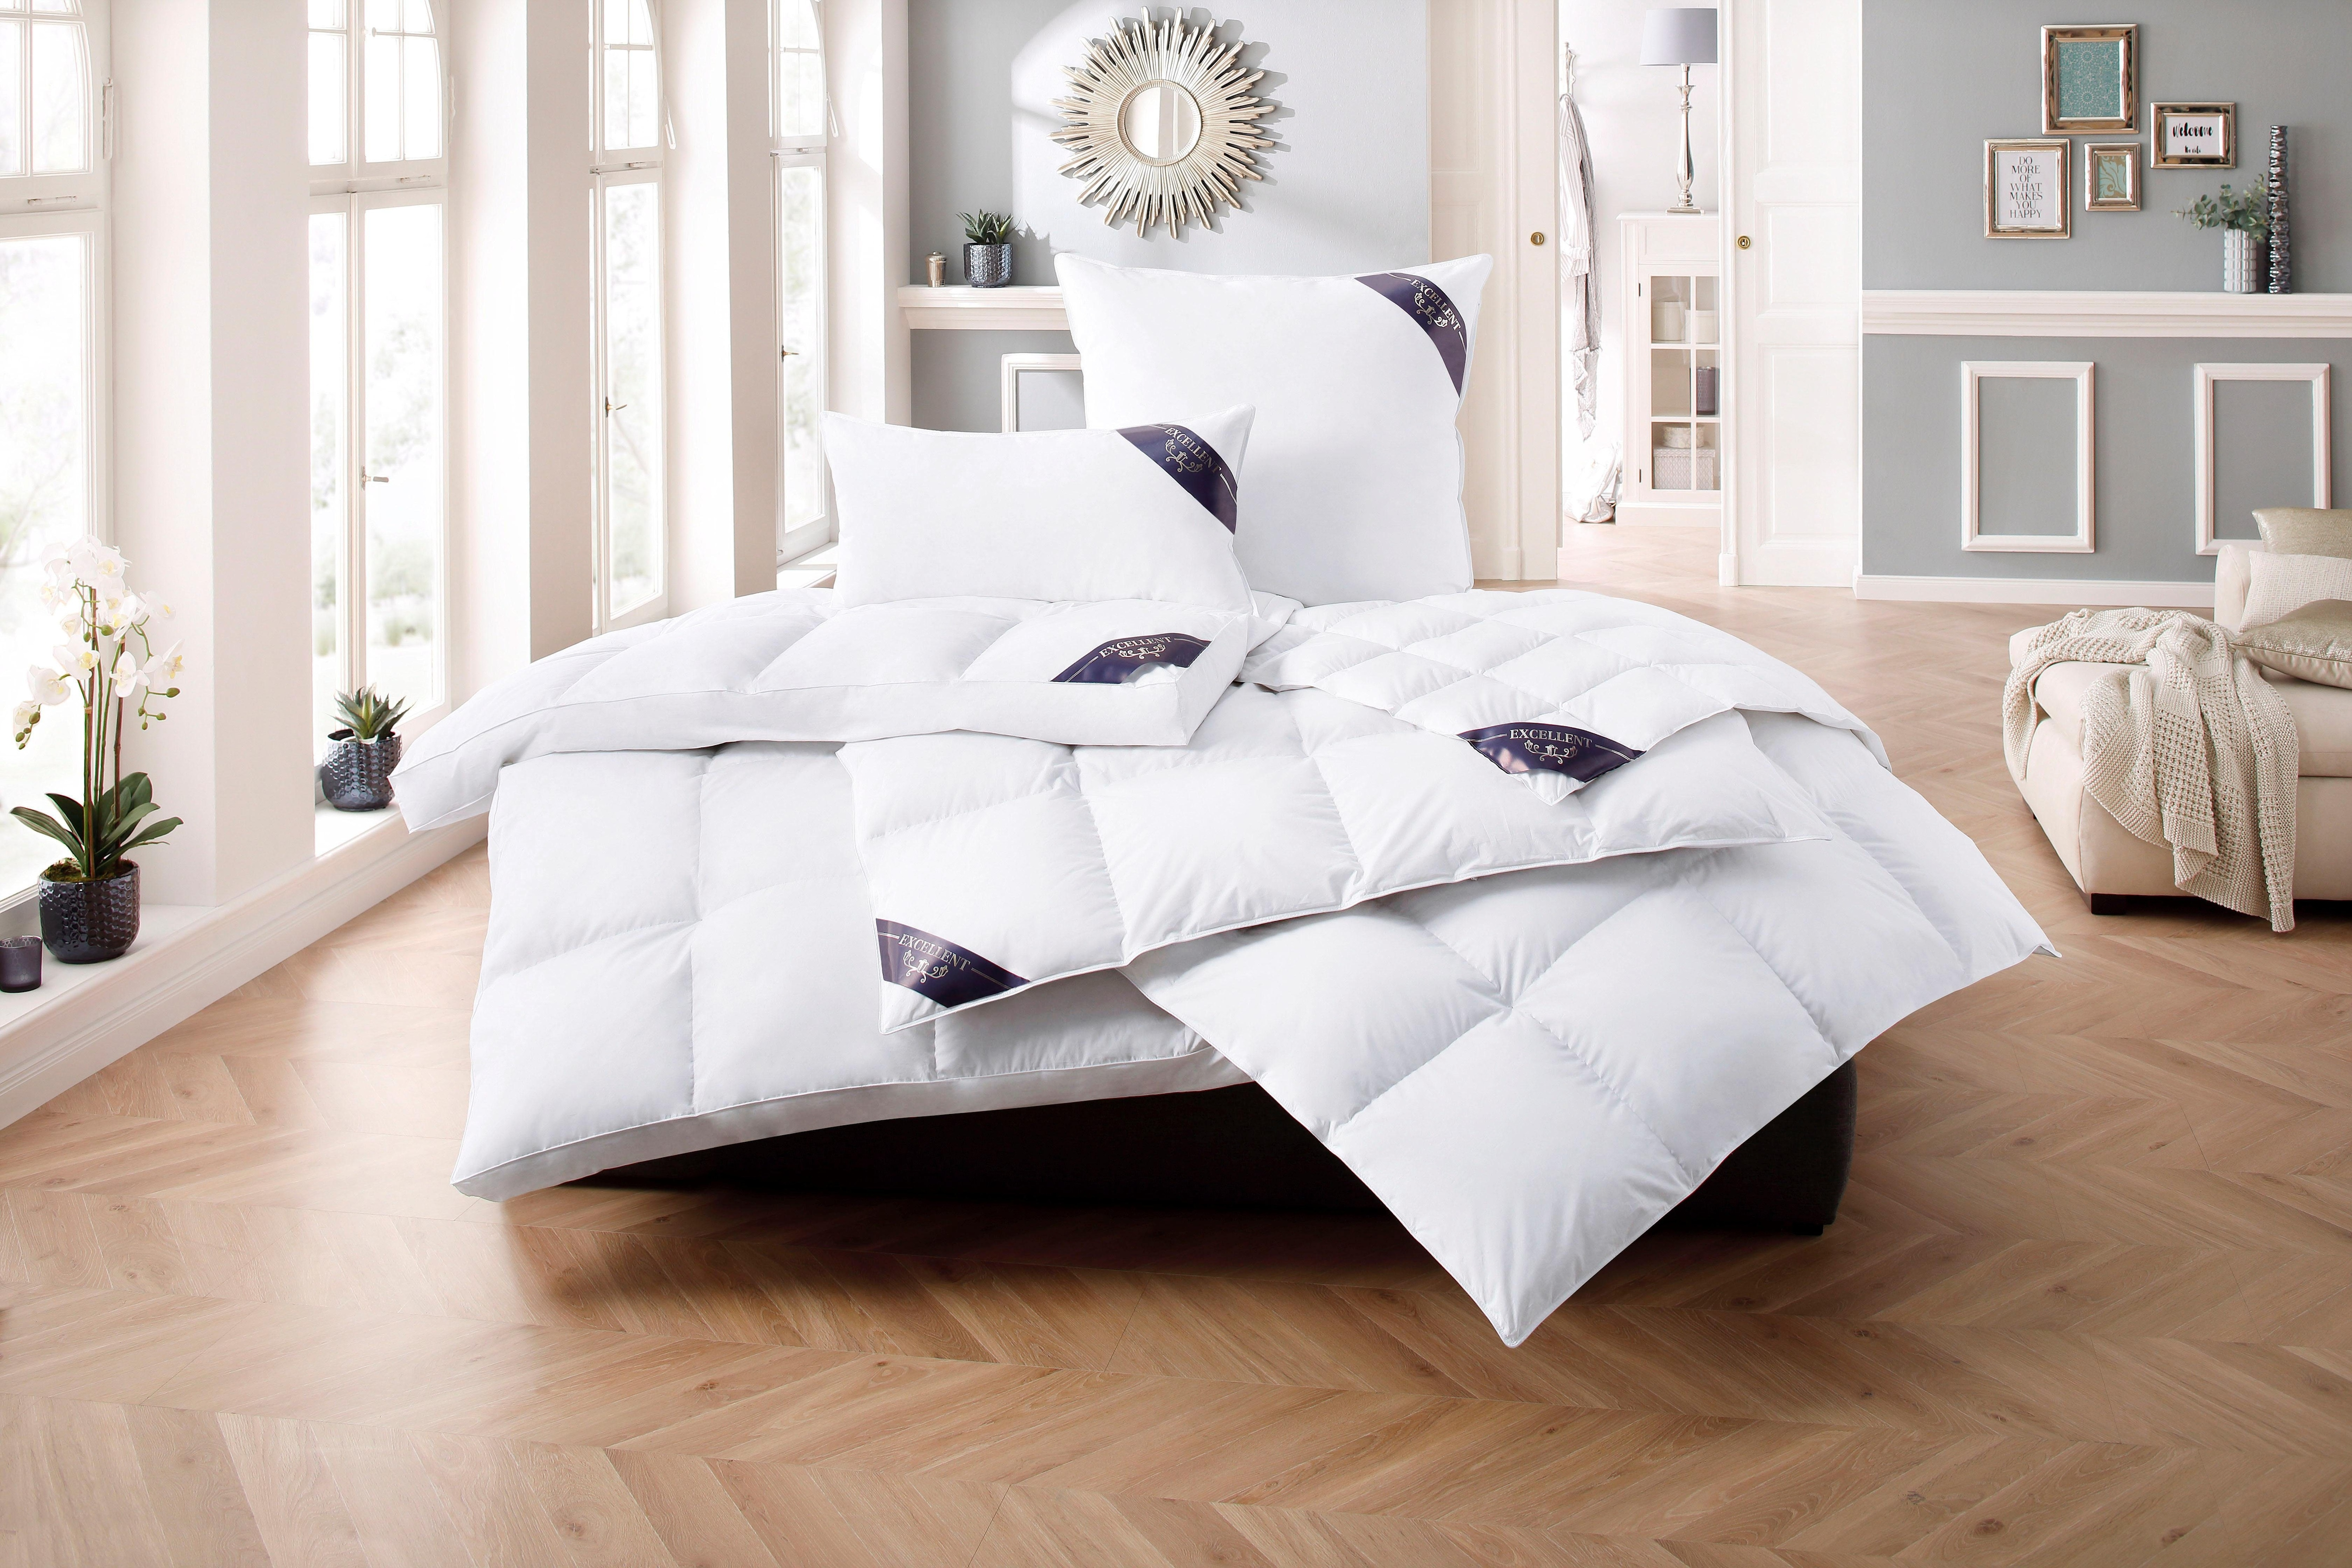 Daunenbettdecke Luxus Excellent leicht Füllung: 80% Daunen 20% Federn Bezug: 100% Baumwolle